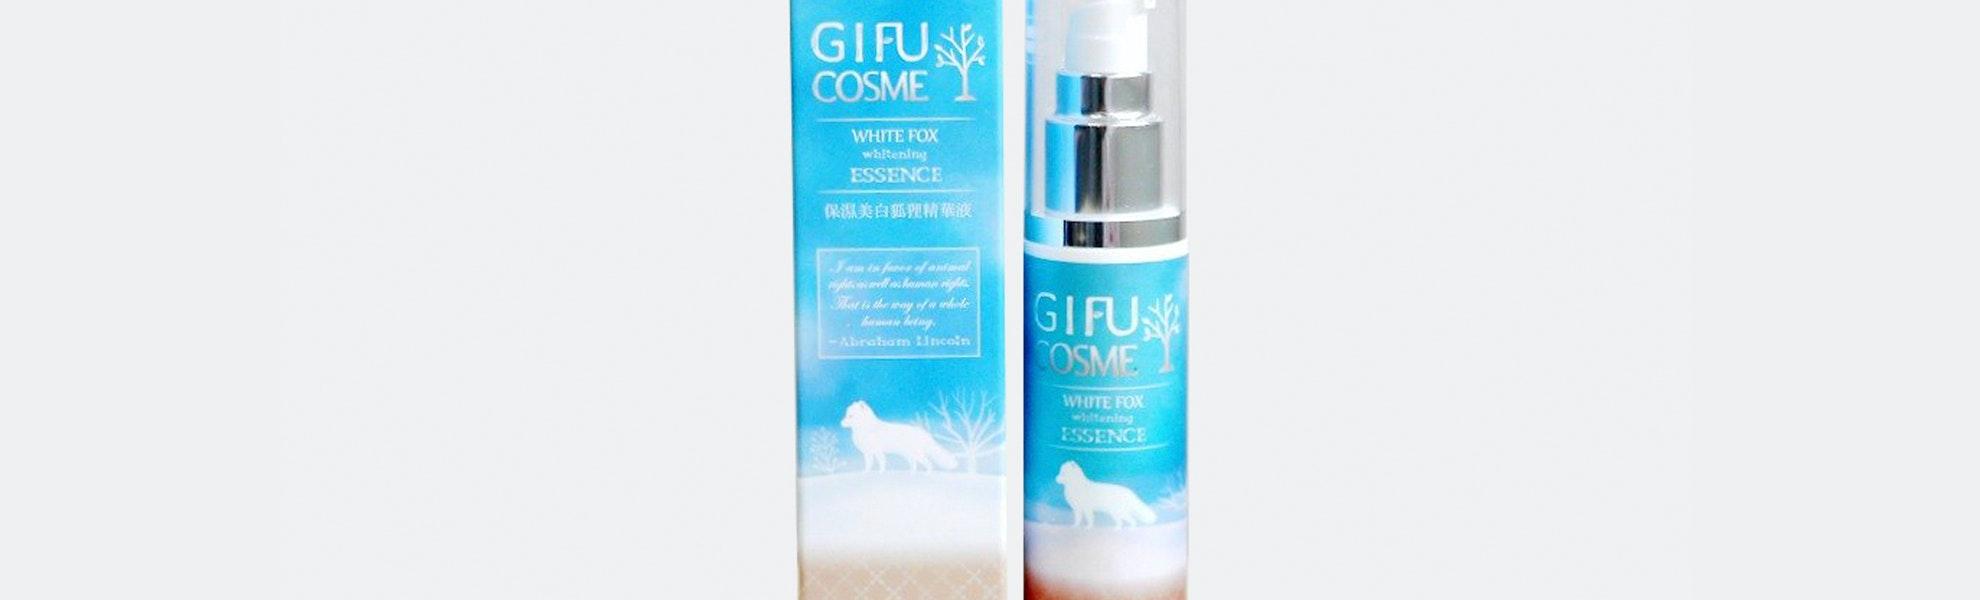 Gifu Cosme White Fox Whitening Essence